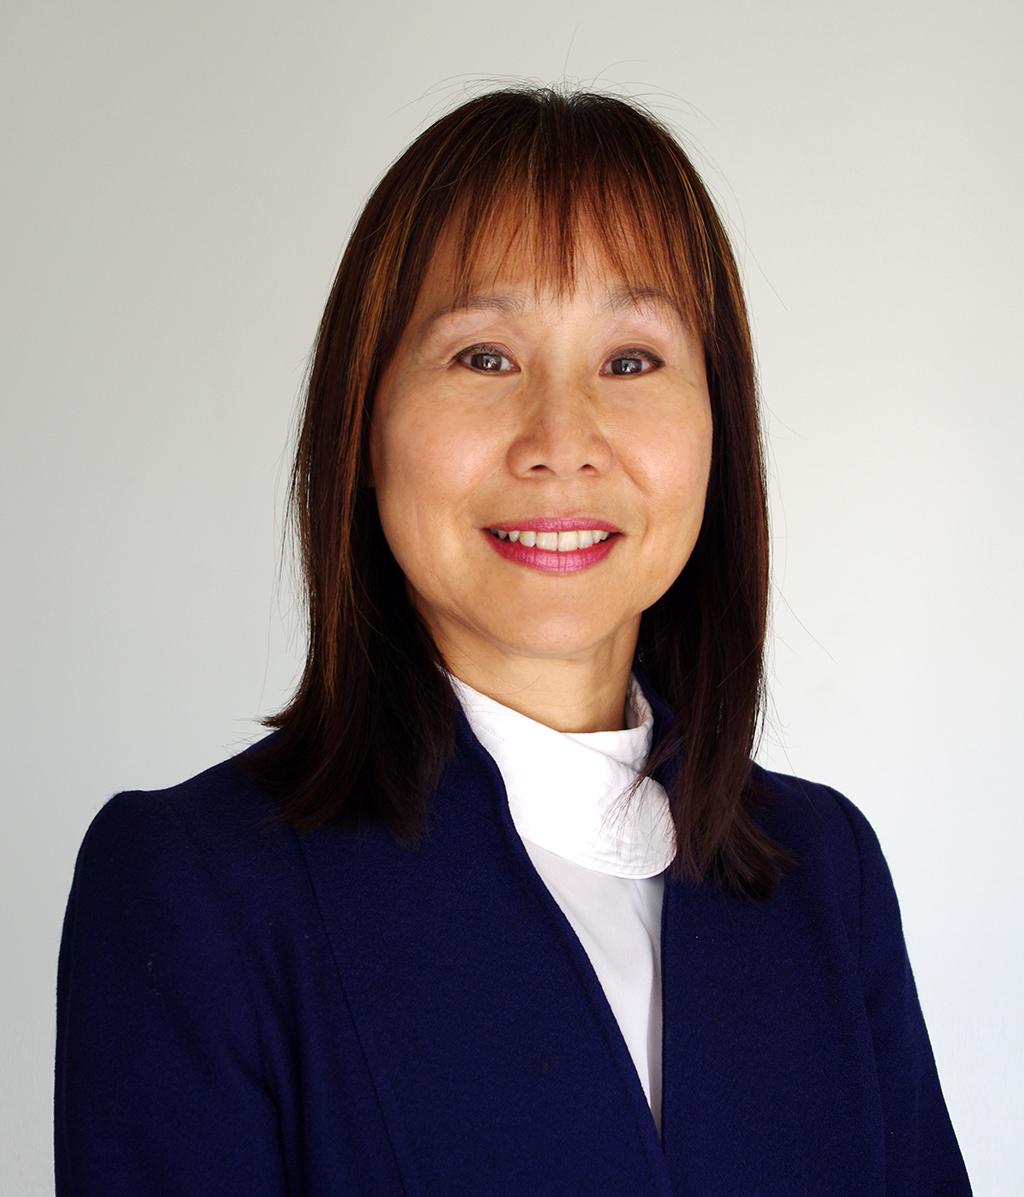 Agnes Maing, B.Admin.